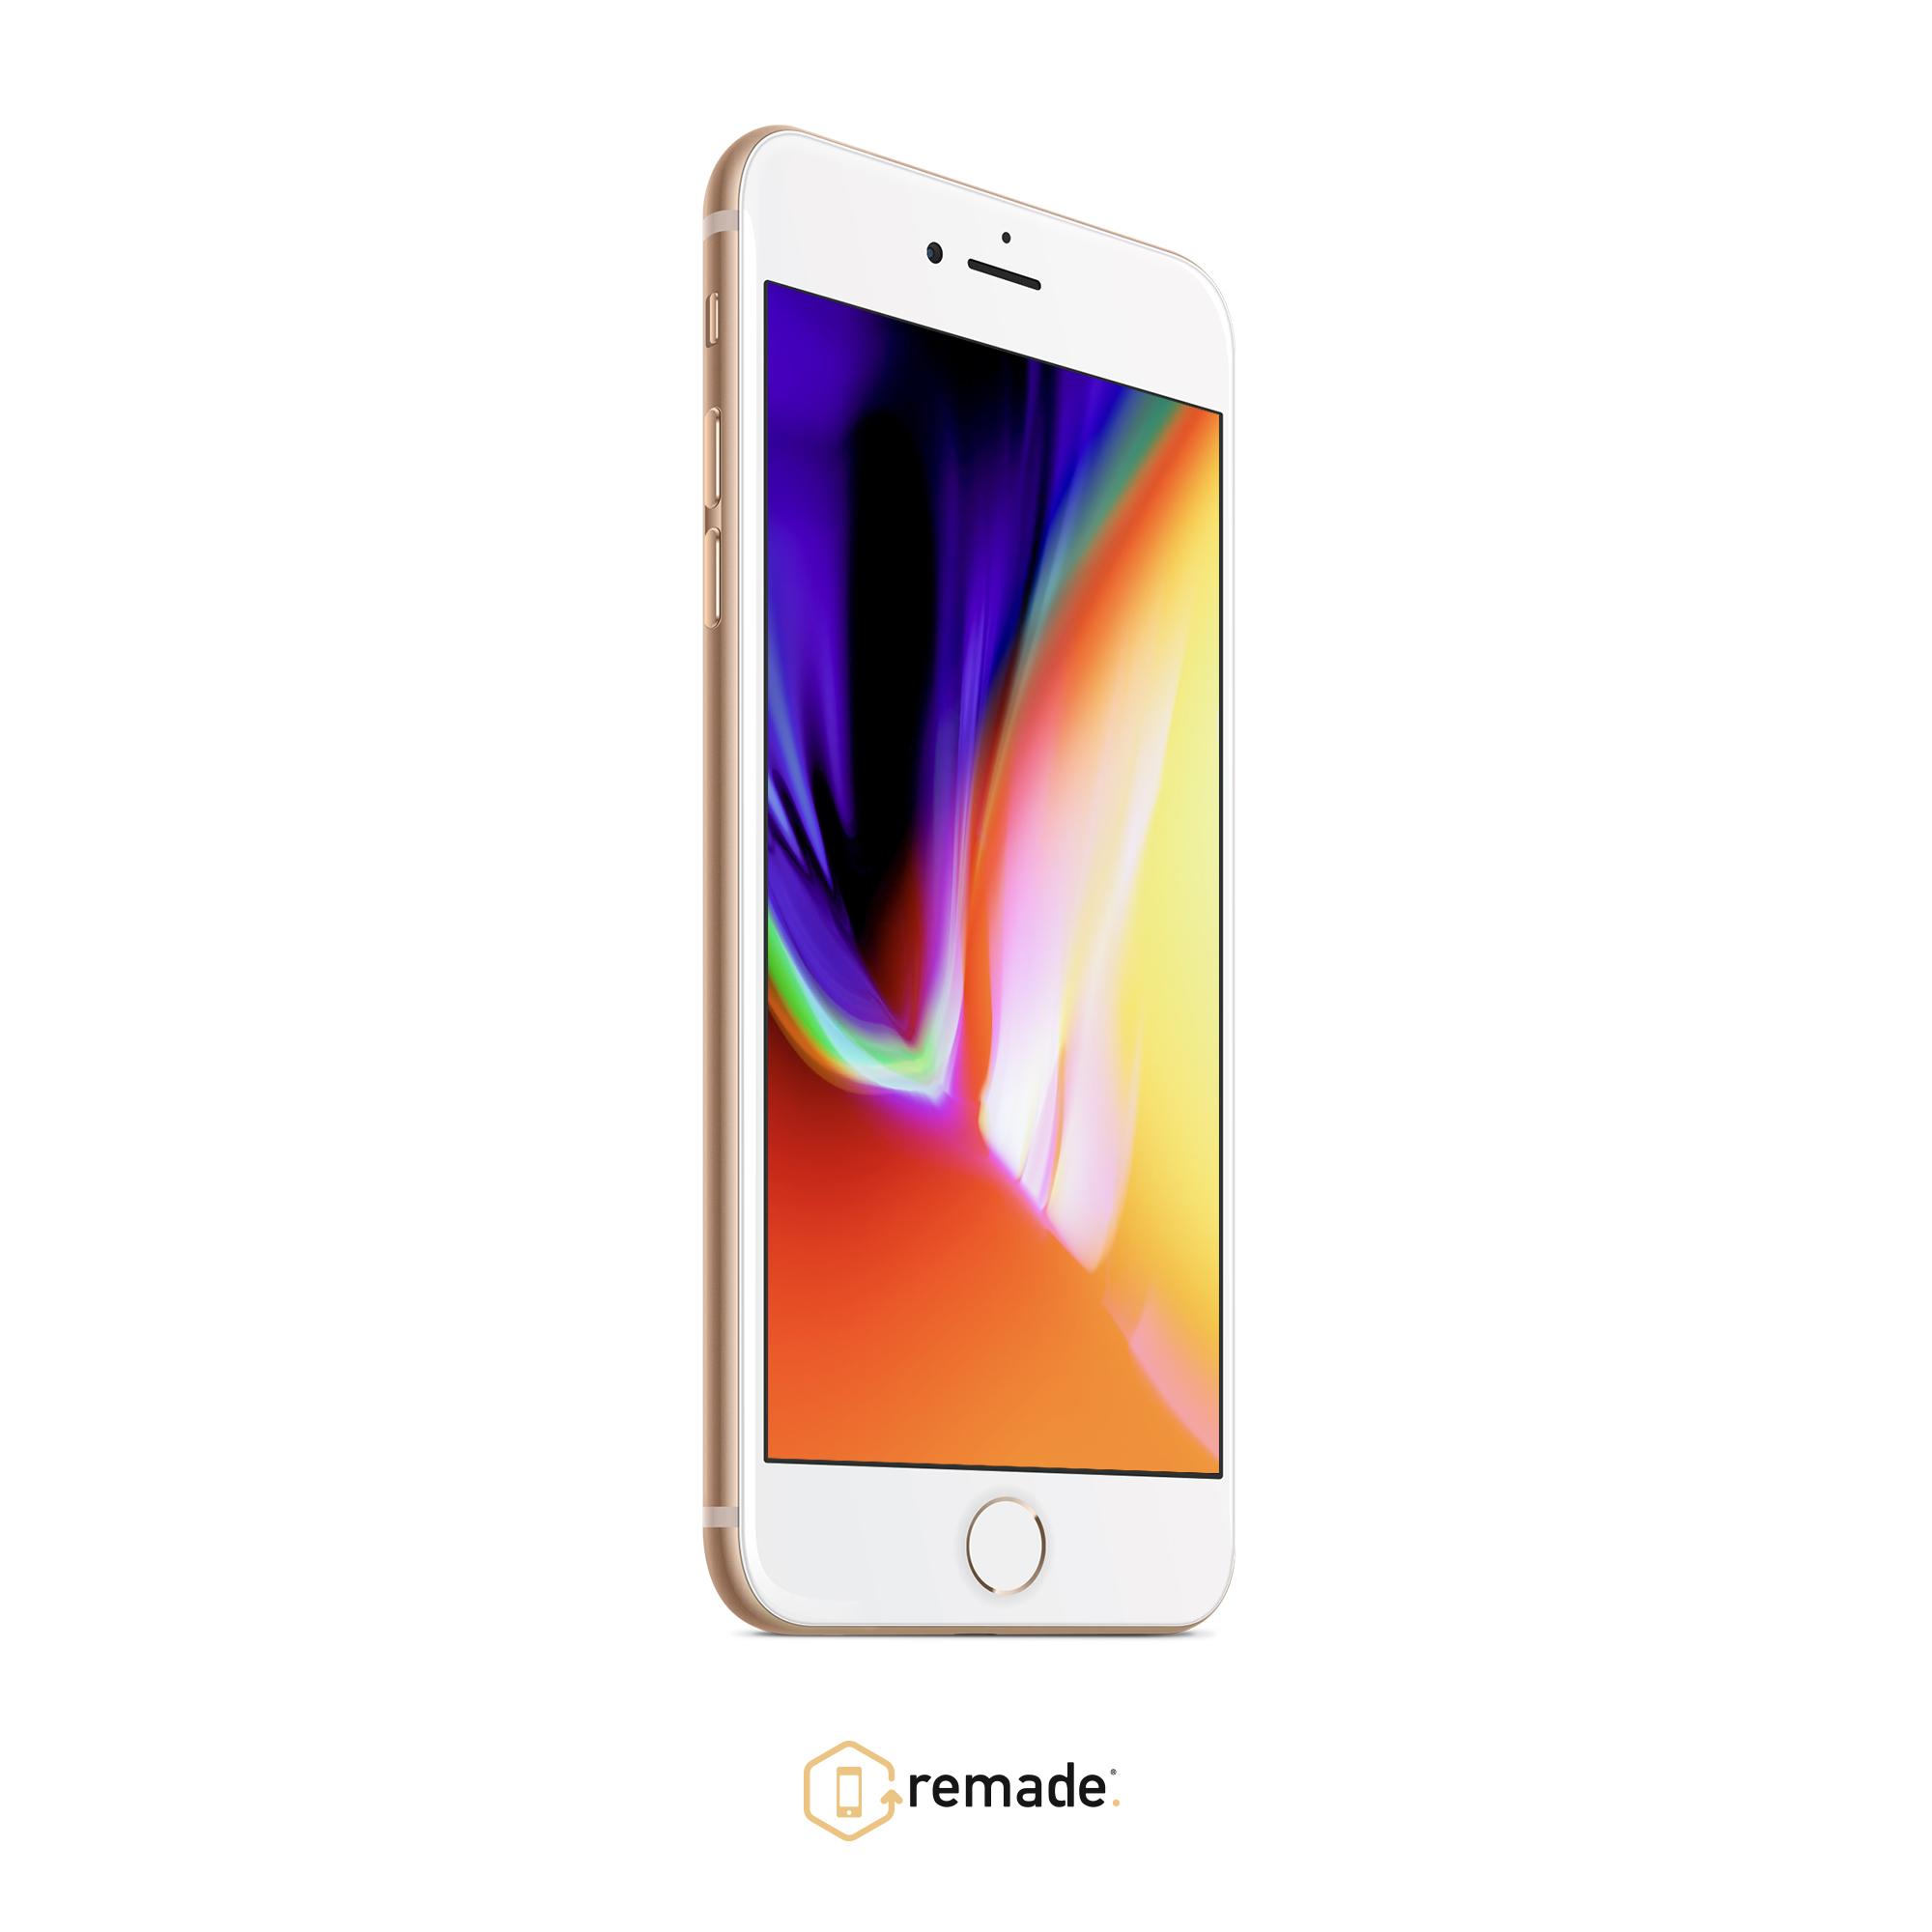 Mobilni telefon Remade Iphone 8, 64 GB, zlata